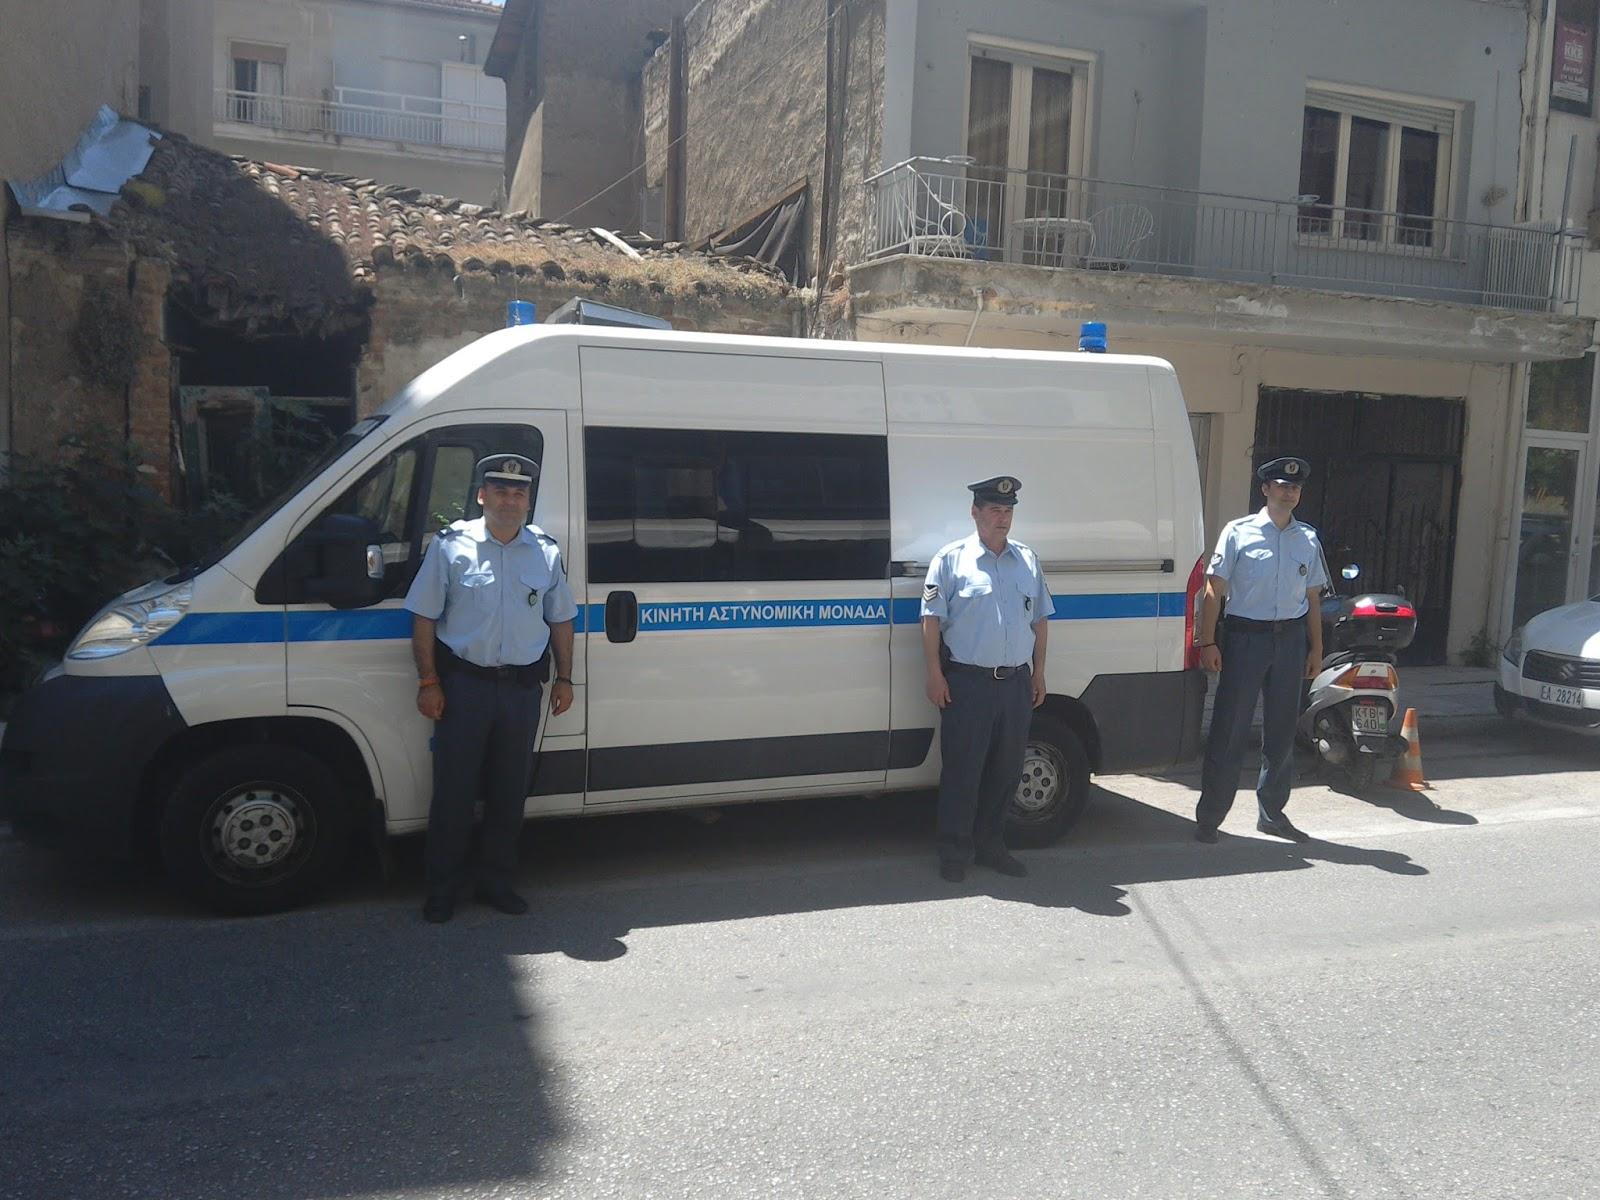 06a02b6fb8e Ξεκίνησε πριν από λίγες μέρες η λειτουργία της Κινητής Αστυνομικής Μοναδας  στο νομό της Καστοριάς με στόχο να αναβαθμιστεί η ποιότητα ζωής των τοπικών  ...